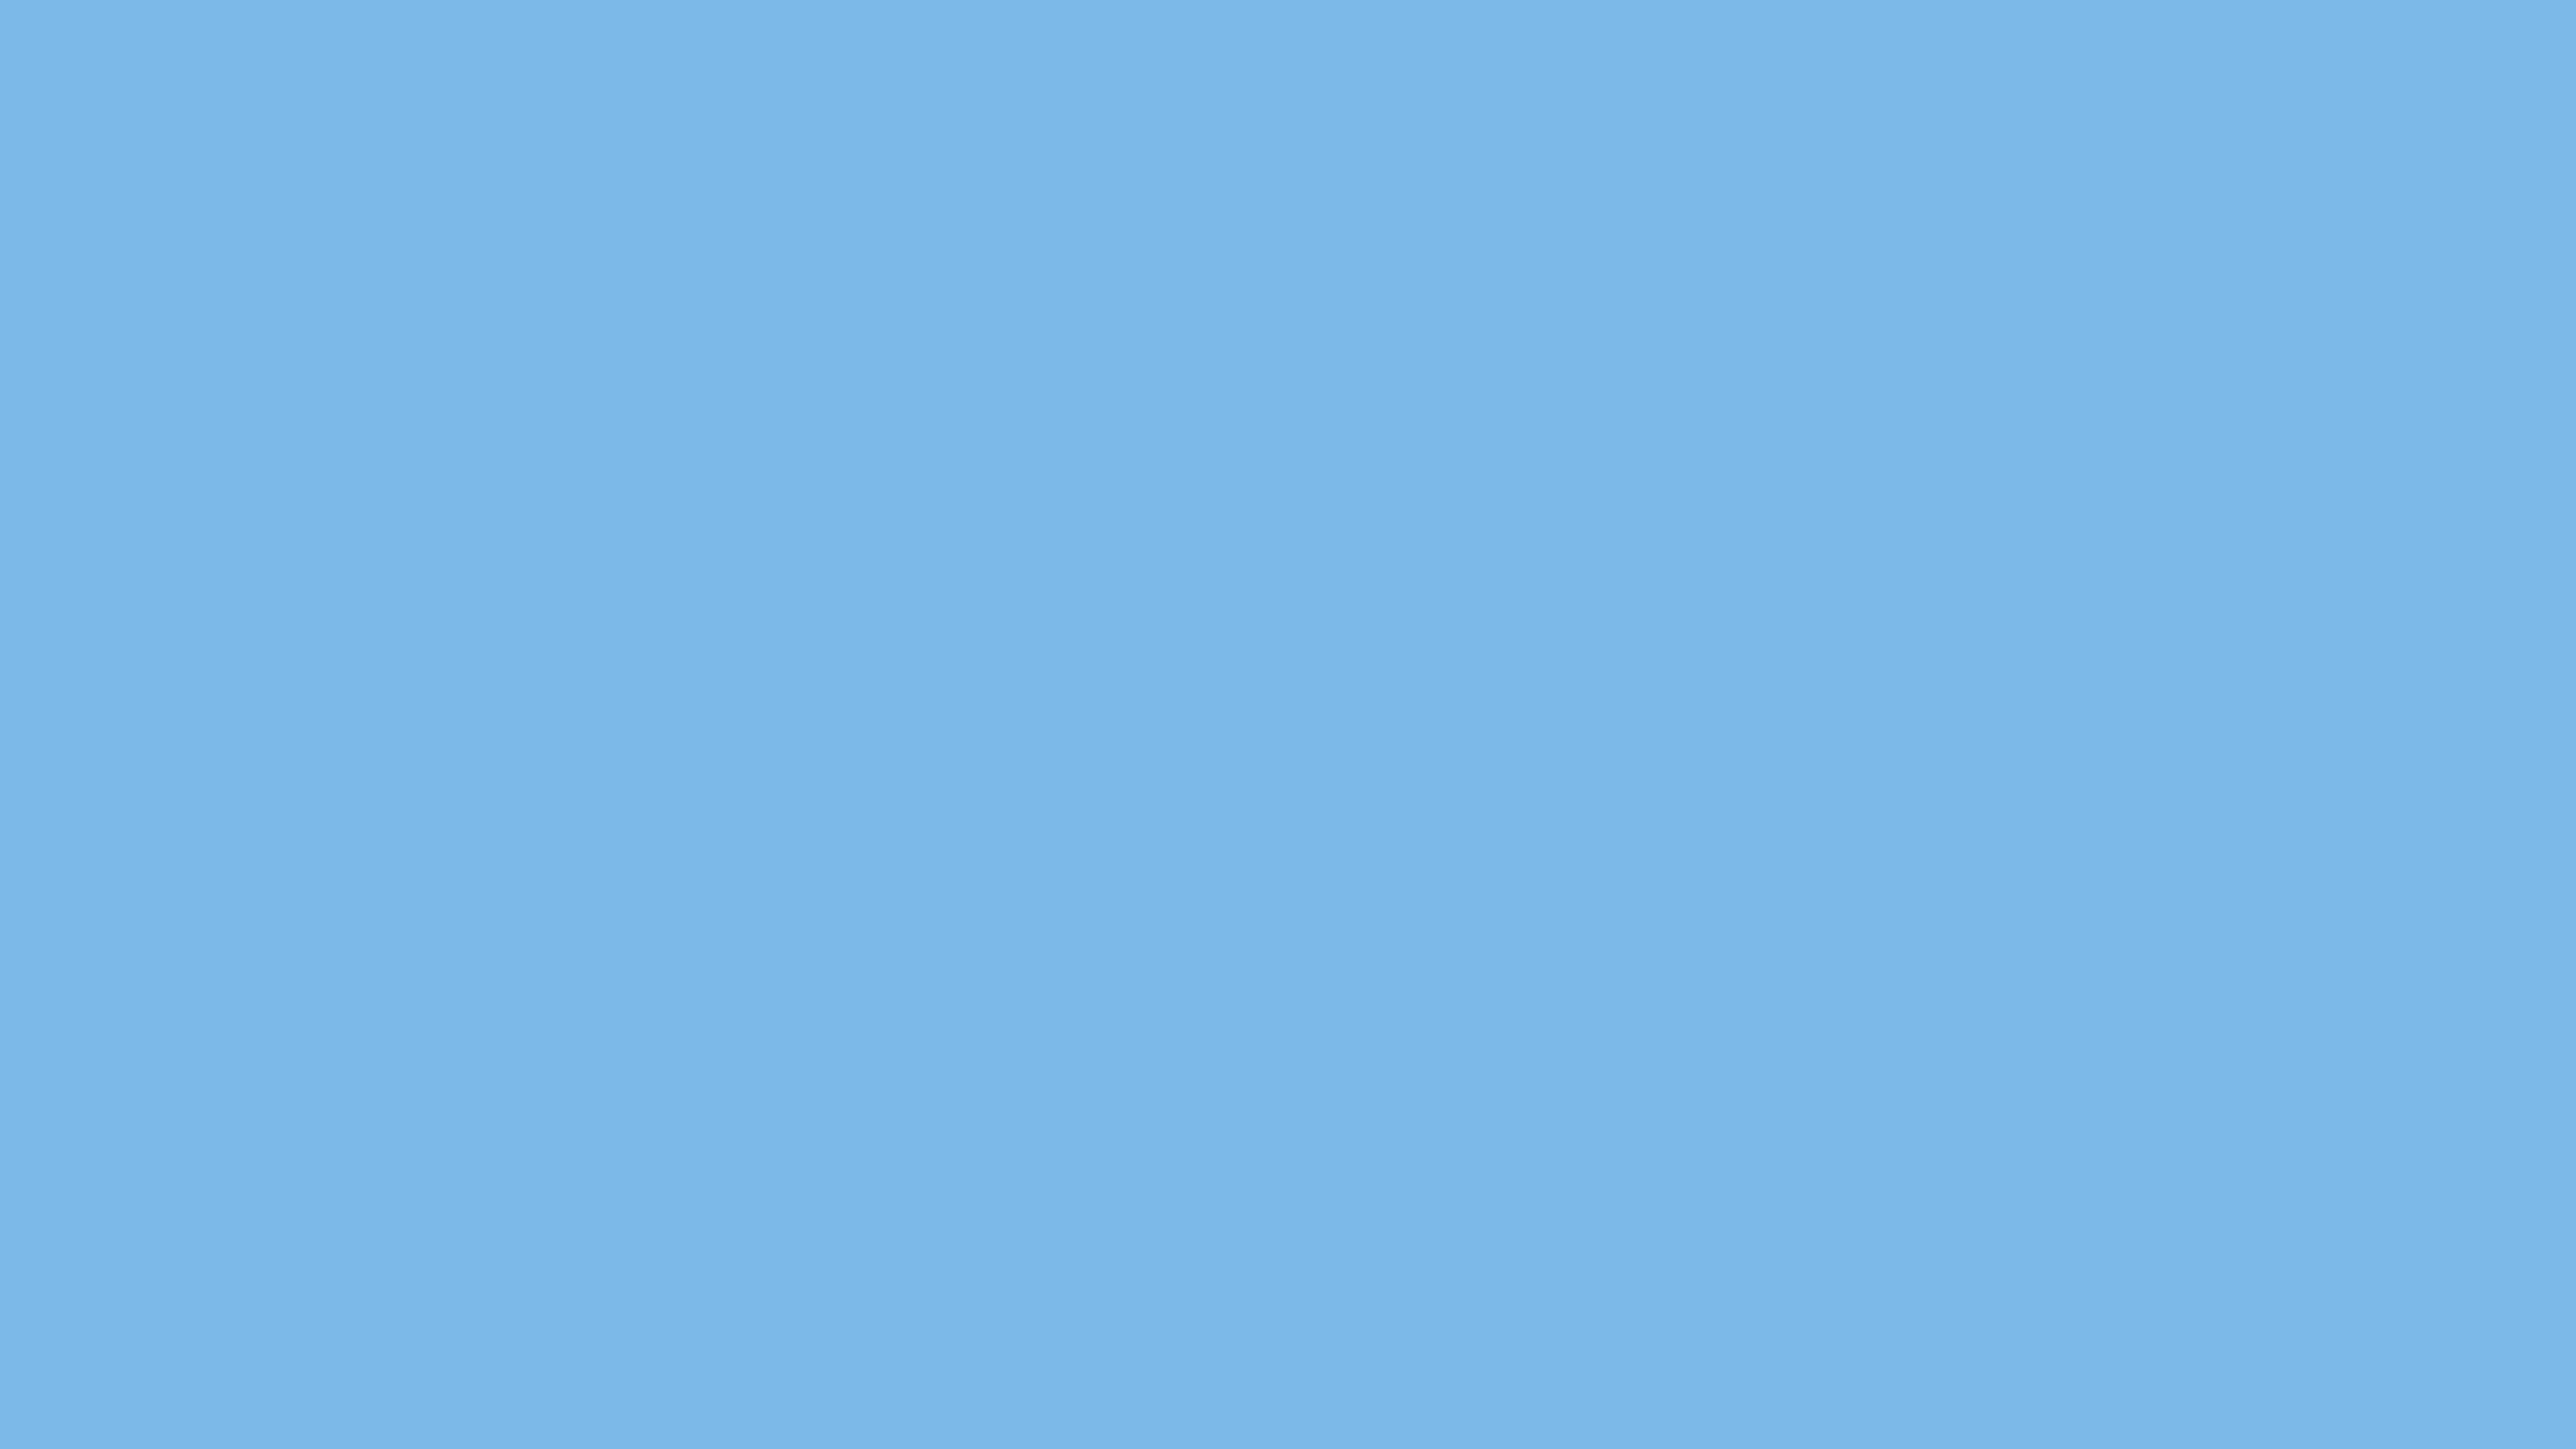 4096x2304 Aero Solid Color Background